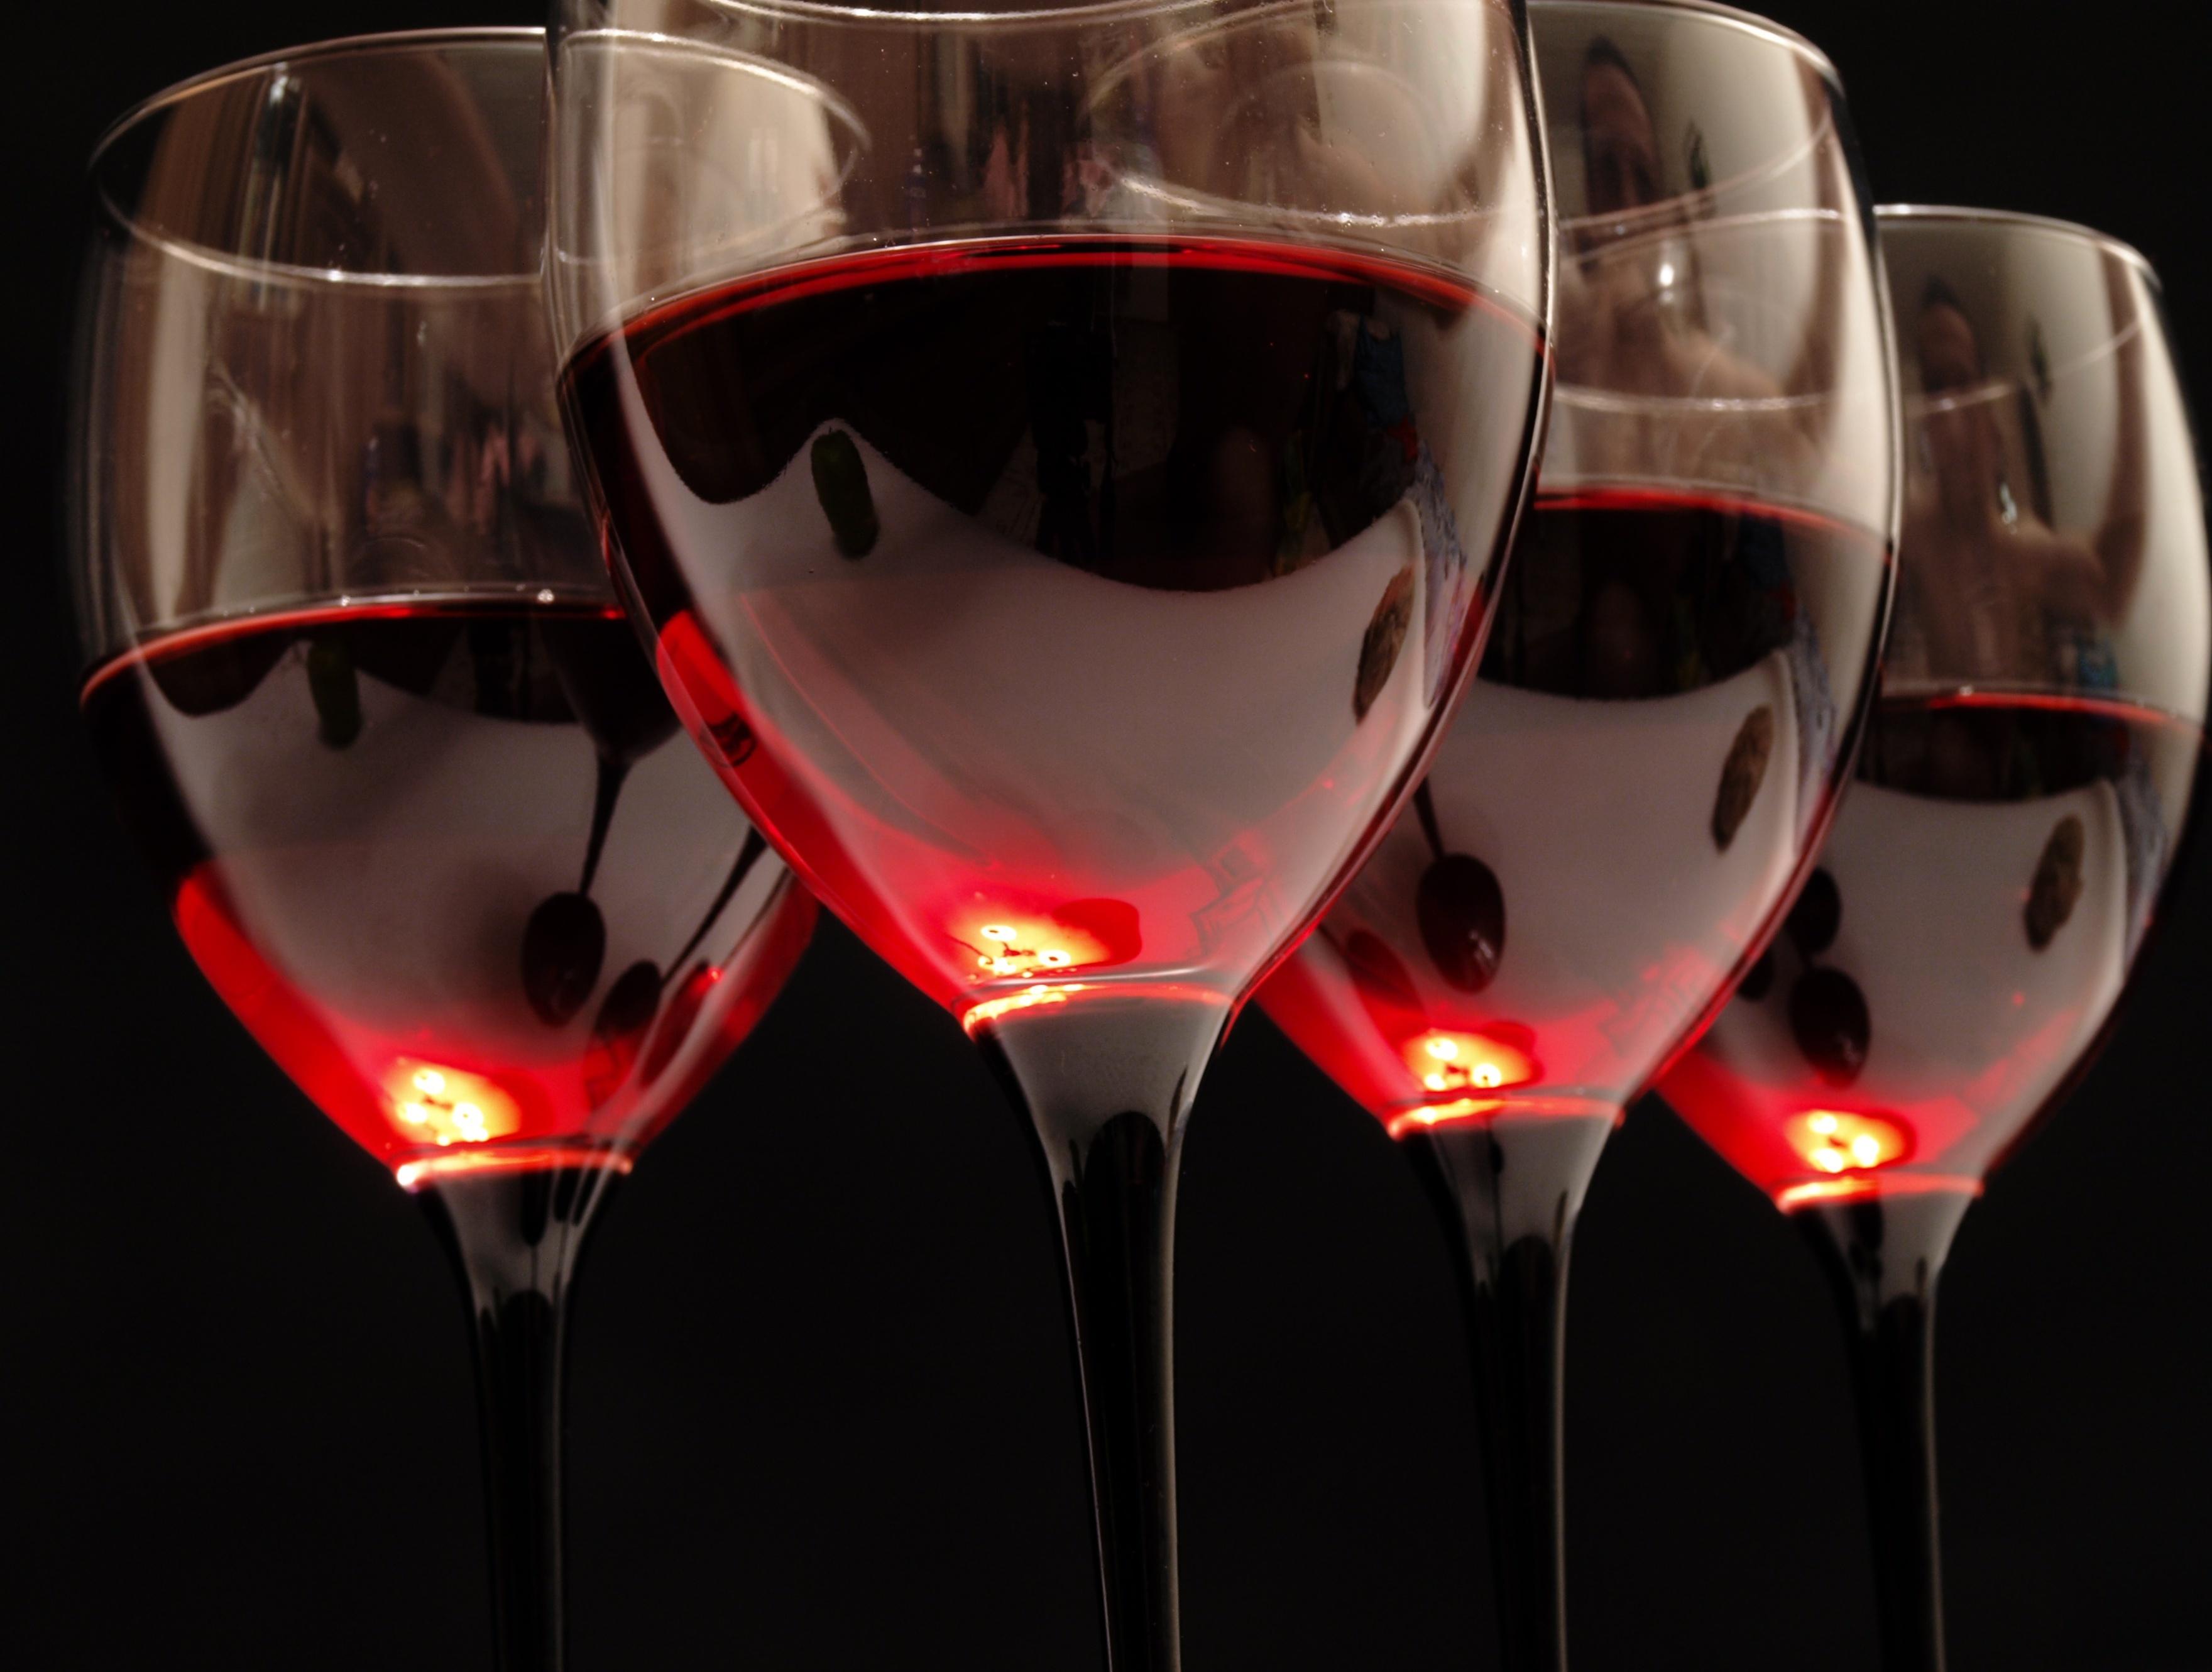 Старый Новый год Vino-krasnoe-bokaly-steklo-84